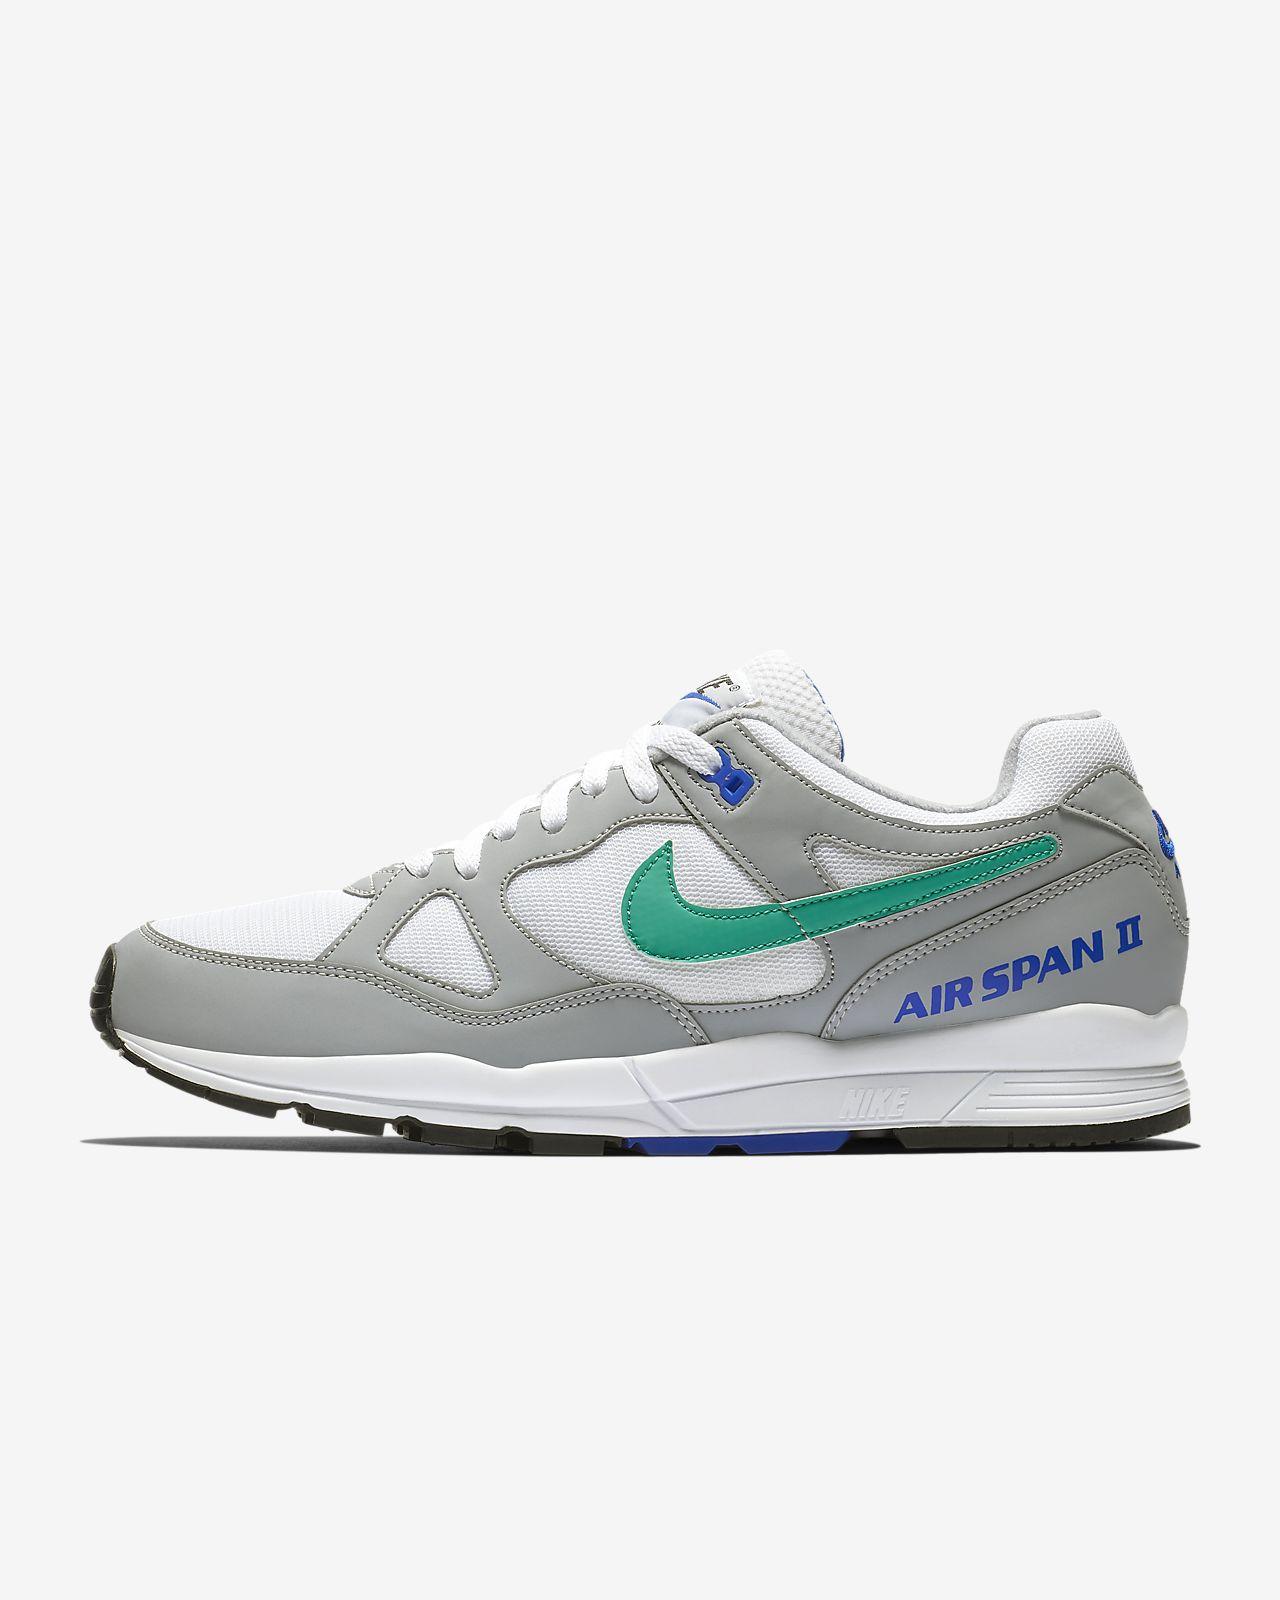 Pánská bota Nike Air Span II. Nike.com CZ 6d58e65a5a